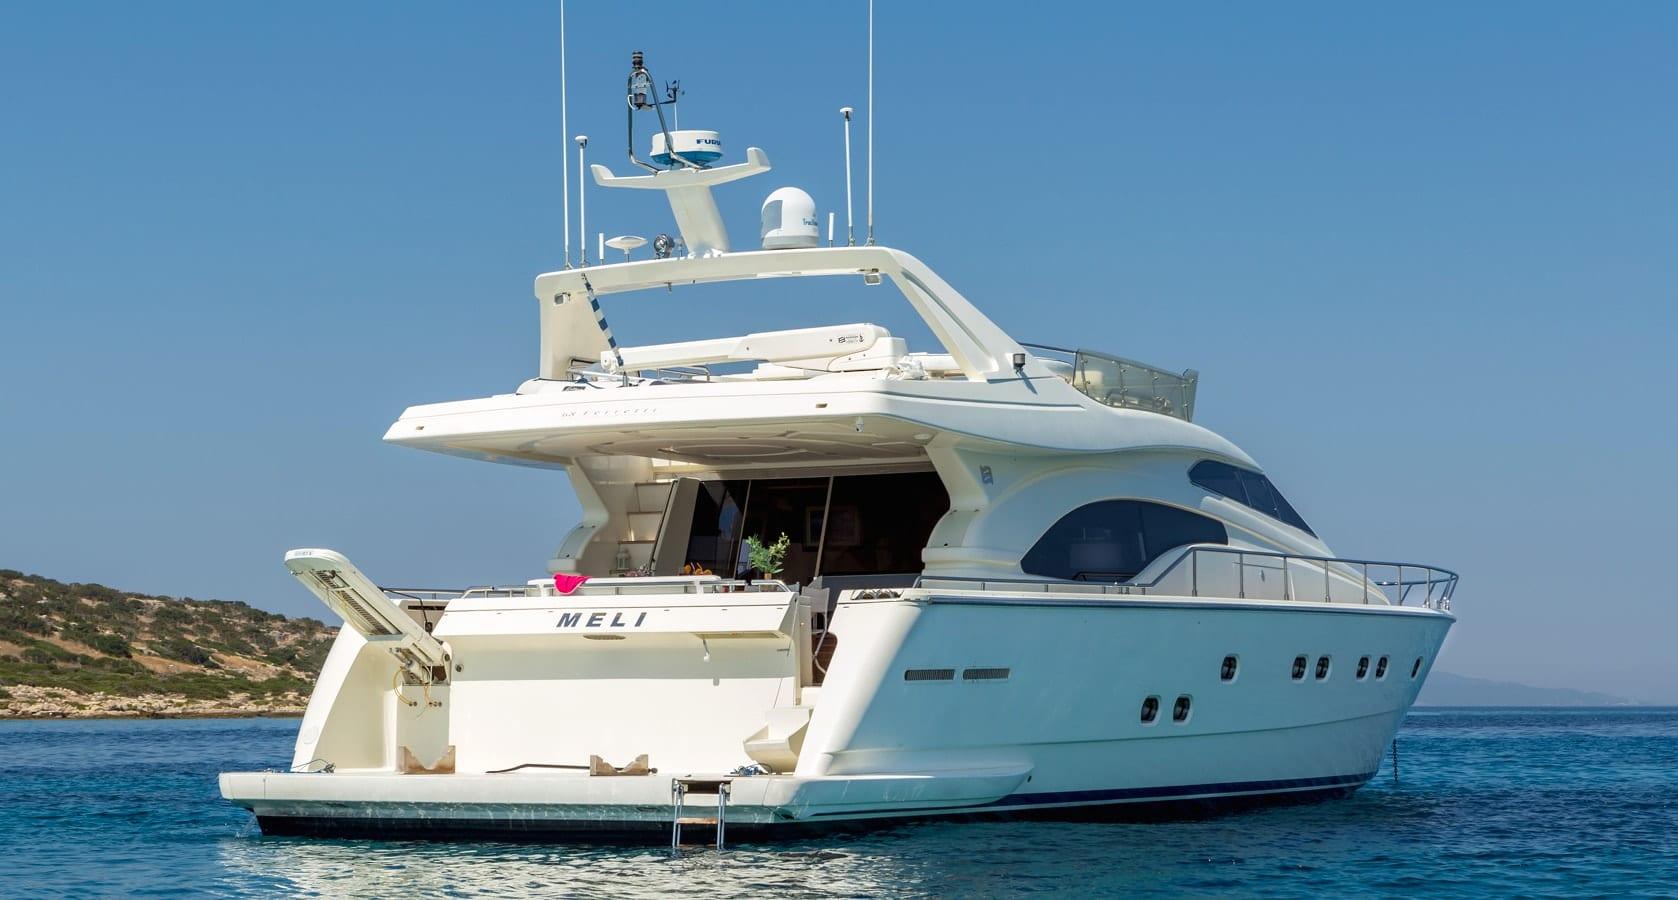 meli motor yacht profile min -  Valef Yachts Chartering - 2901